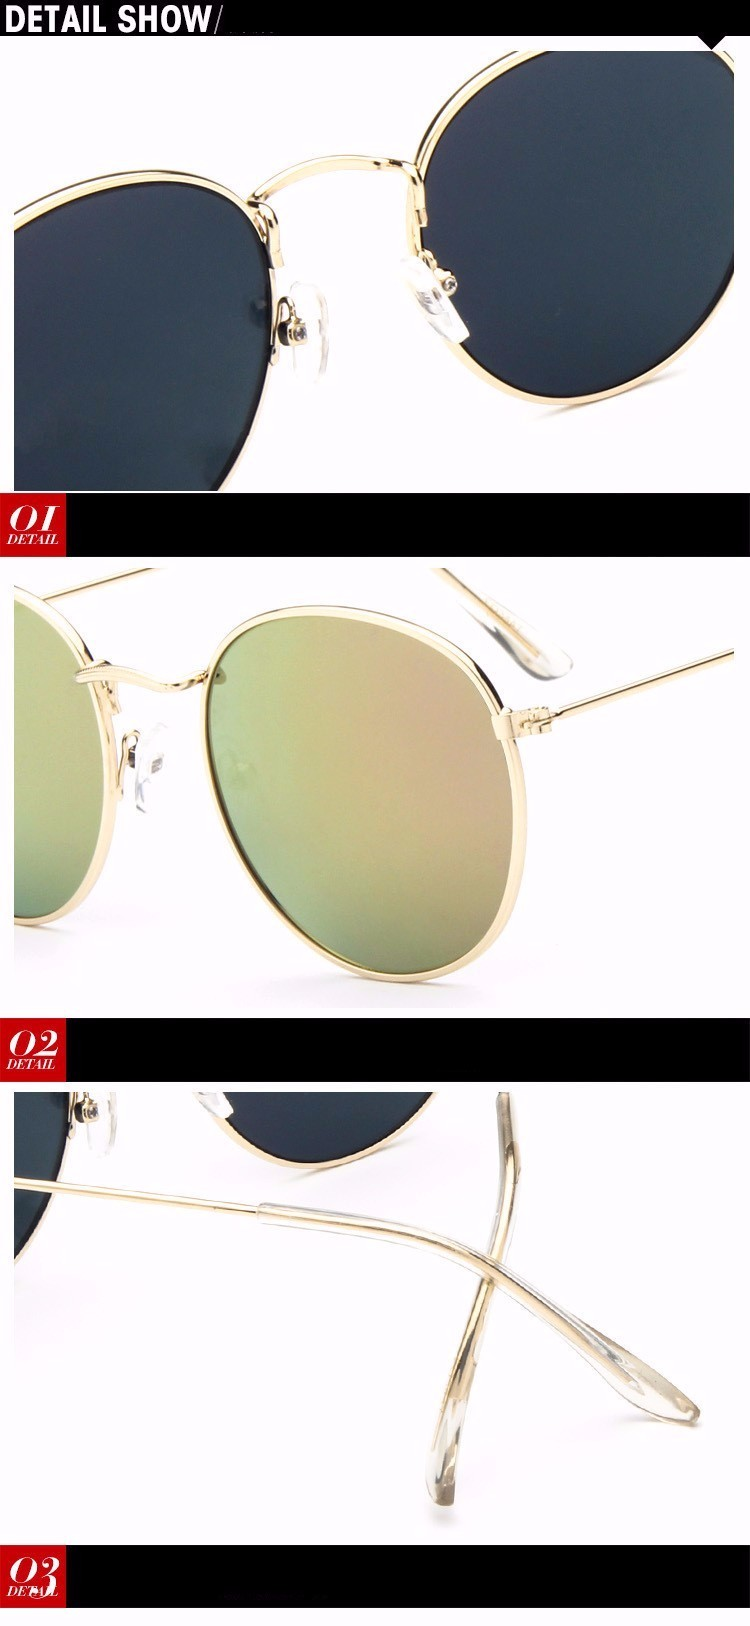 Vintage Round Mirror Sunglasses 24